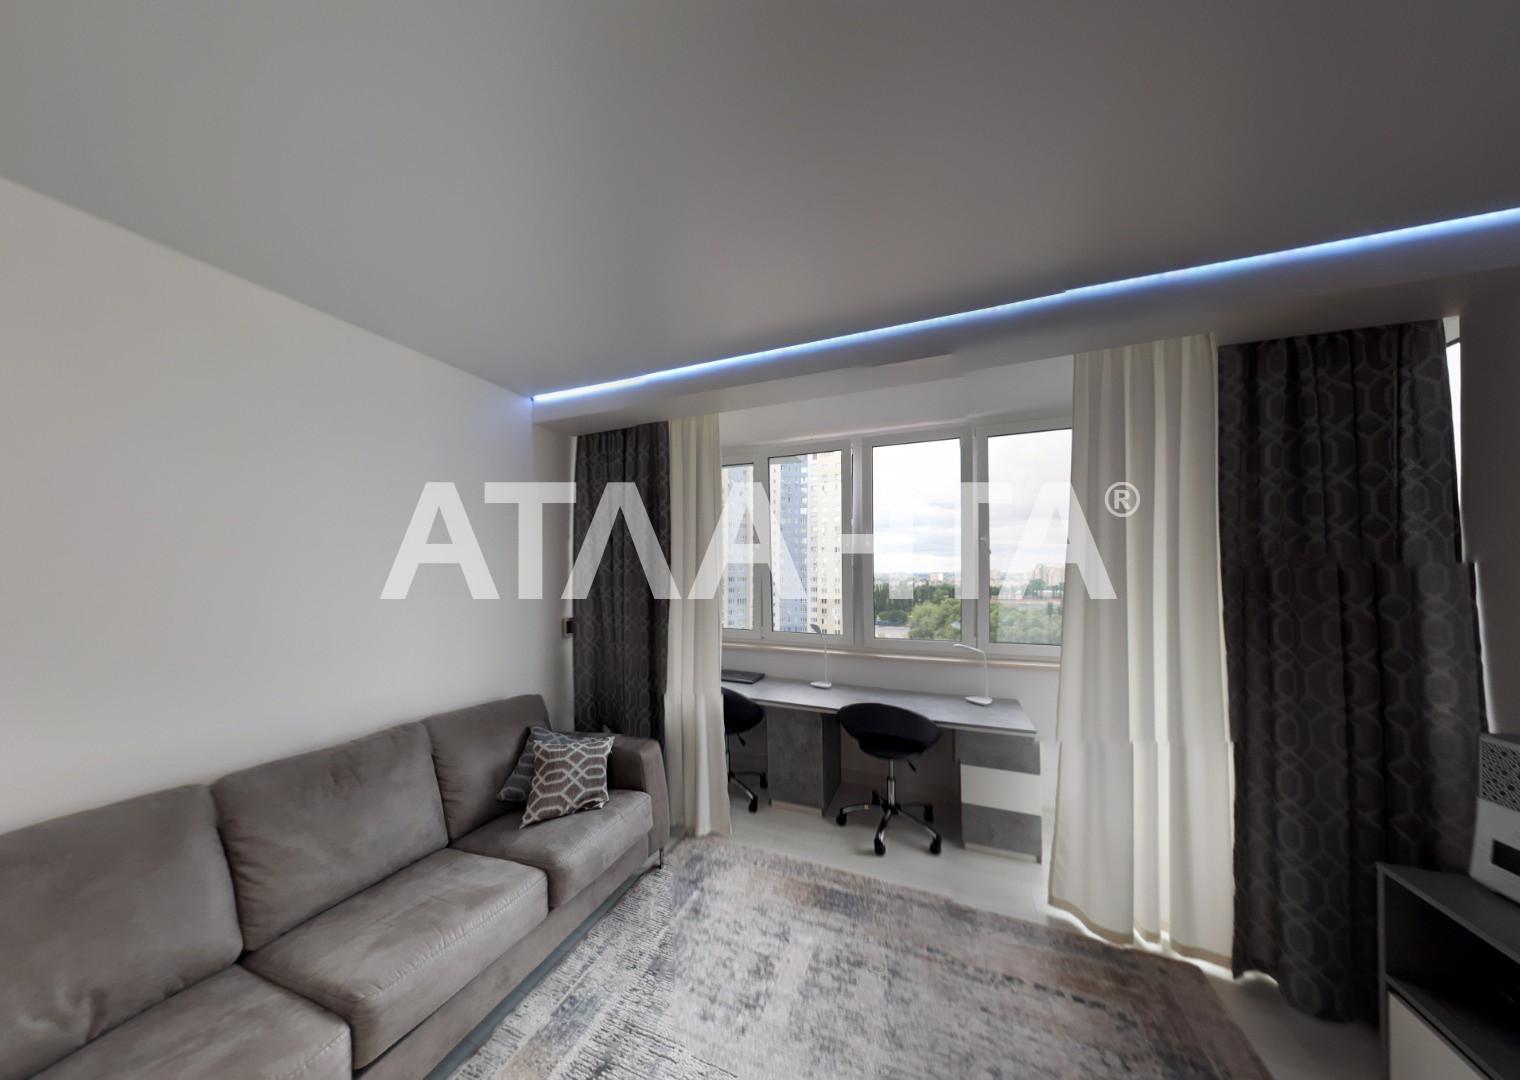 Продается 3-комнатная Квартира на ул. Просп. Глушкова — 160 000 у.е. (фото №9)